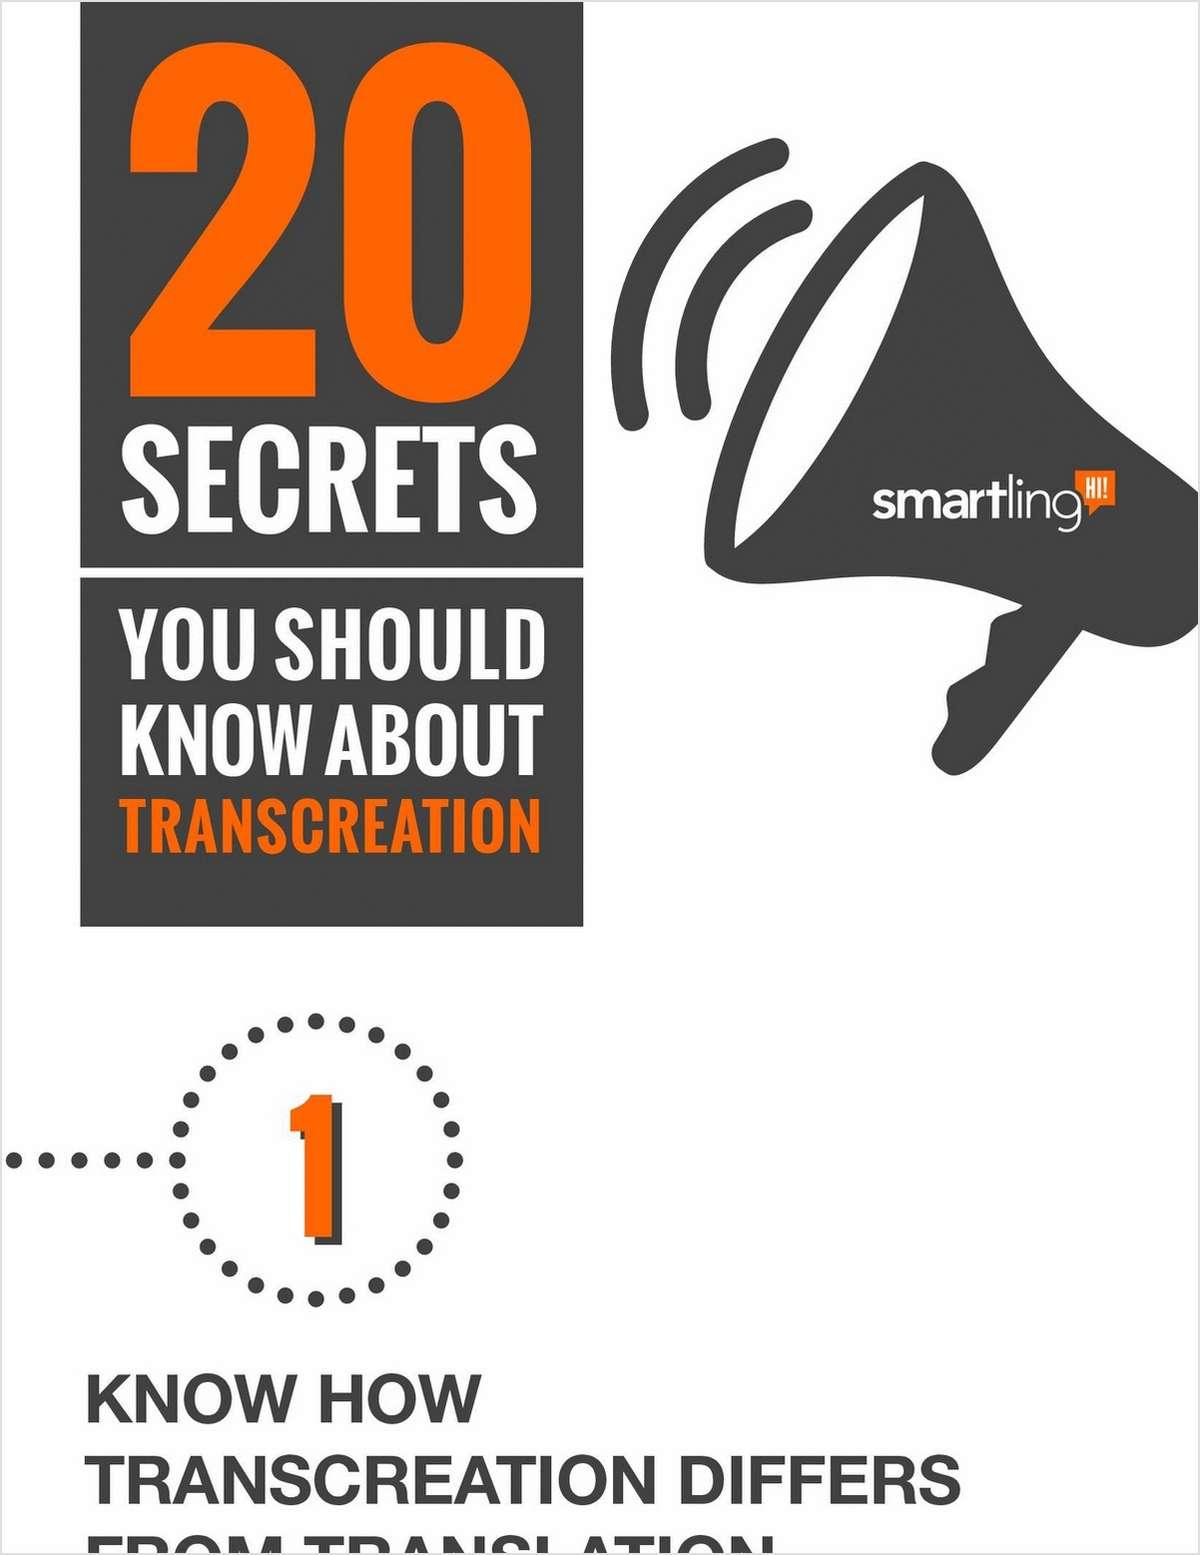 20 Secrets You Should Know About Transcreation